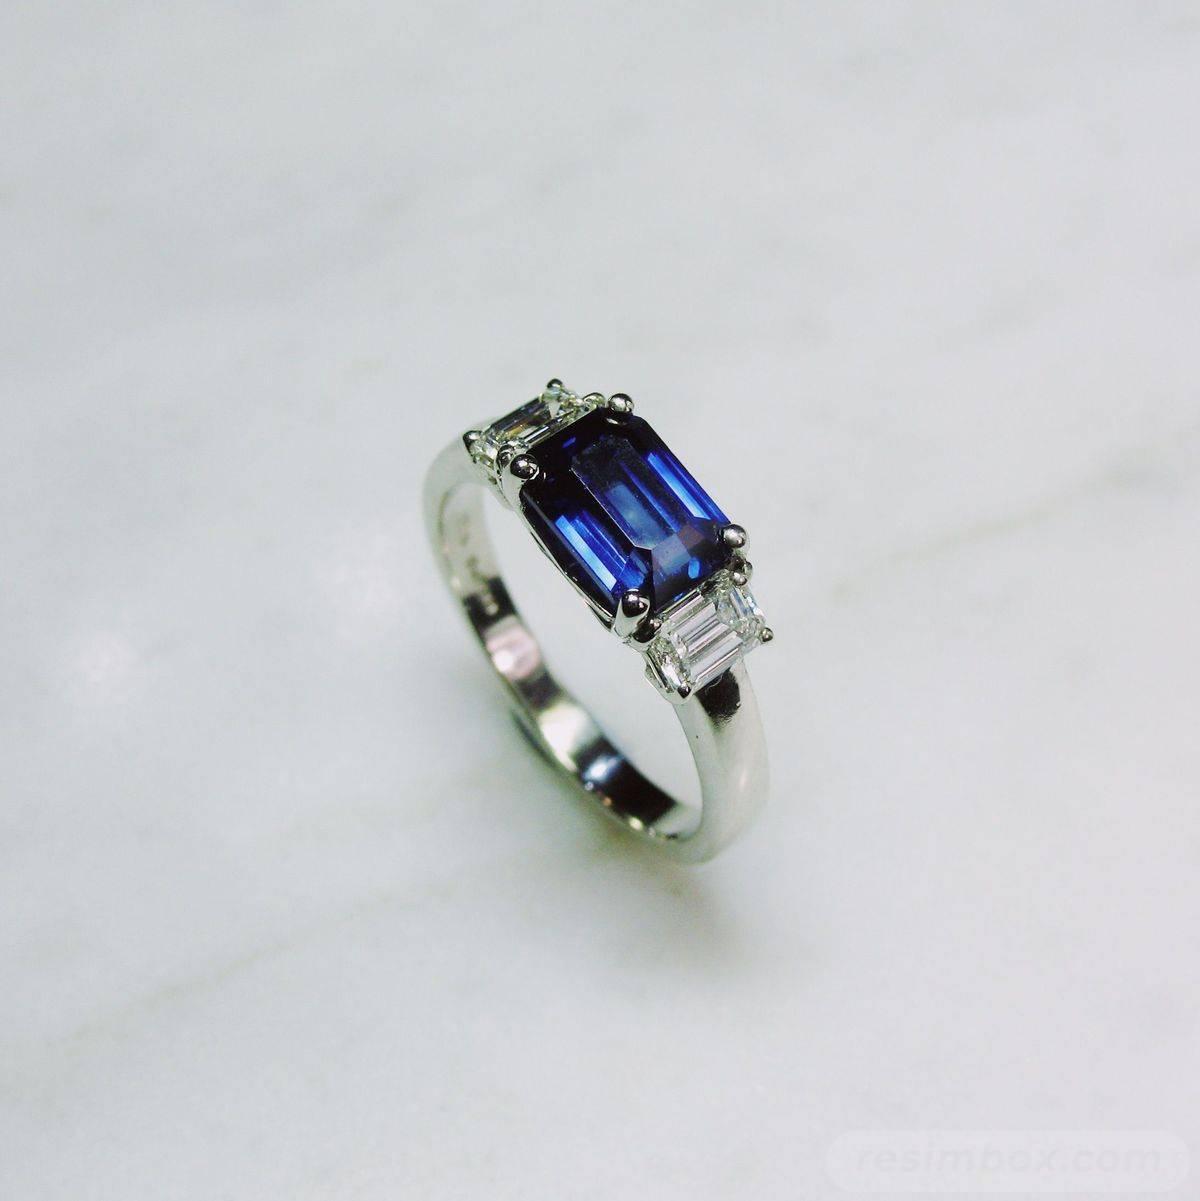 Art deco engagement ring-357121445451046649